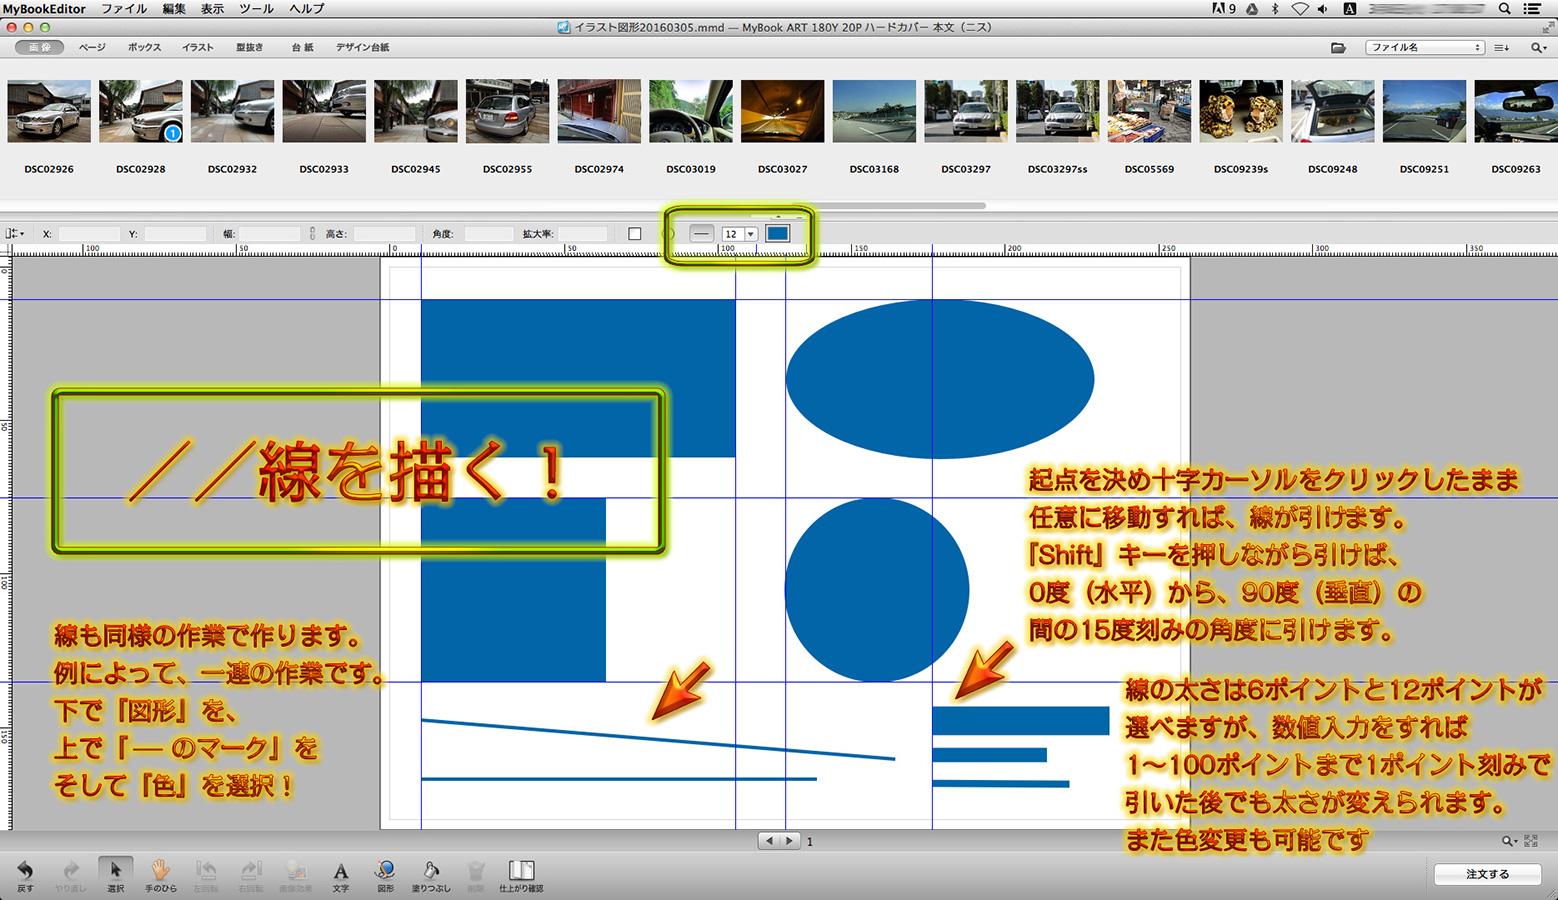 http://moritetsu.info/car/img/mb072-2016-03-08-17-08-37.jpg